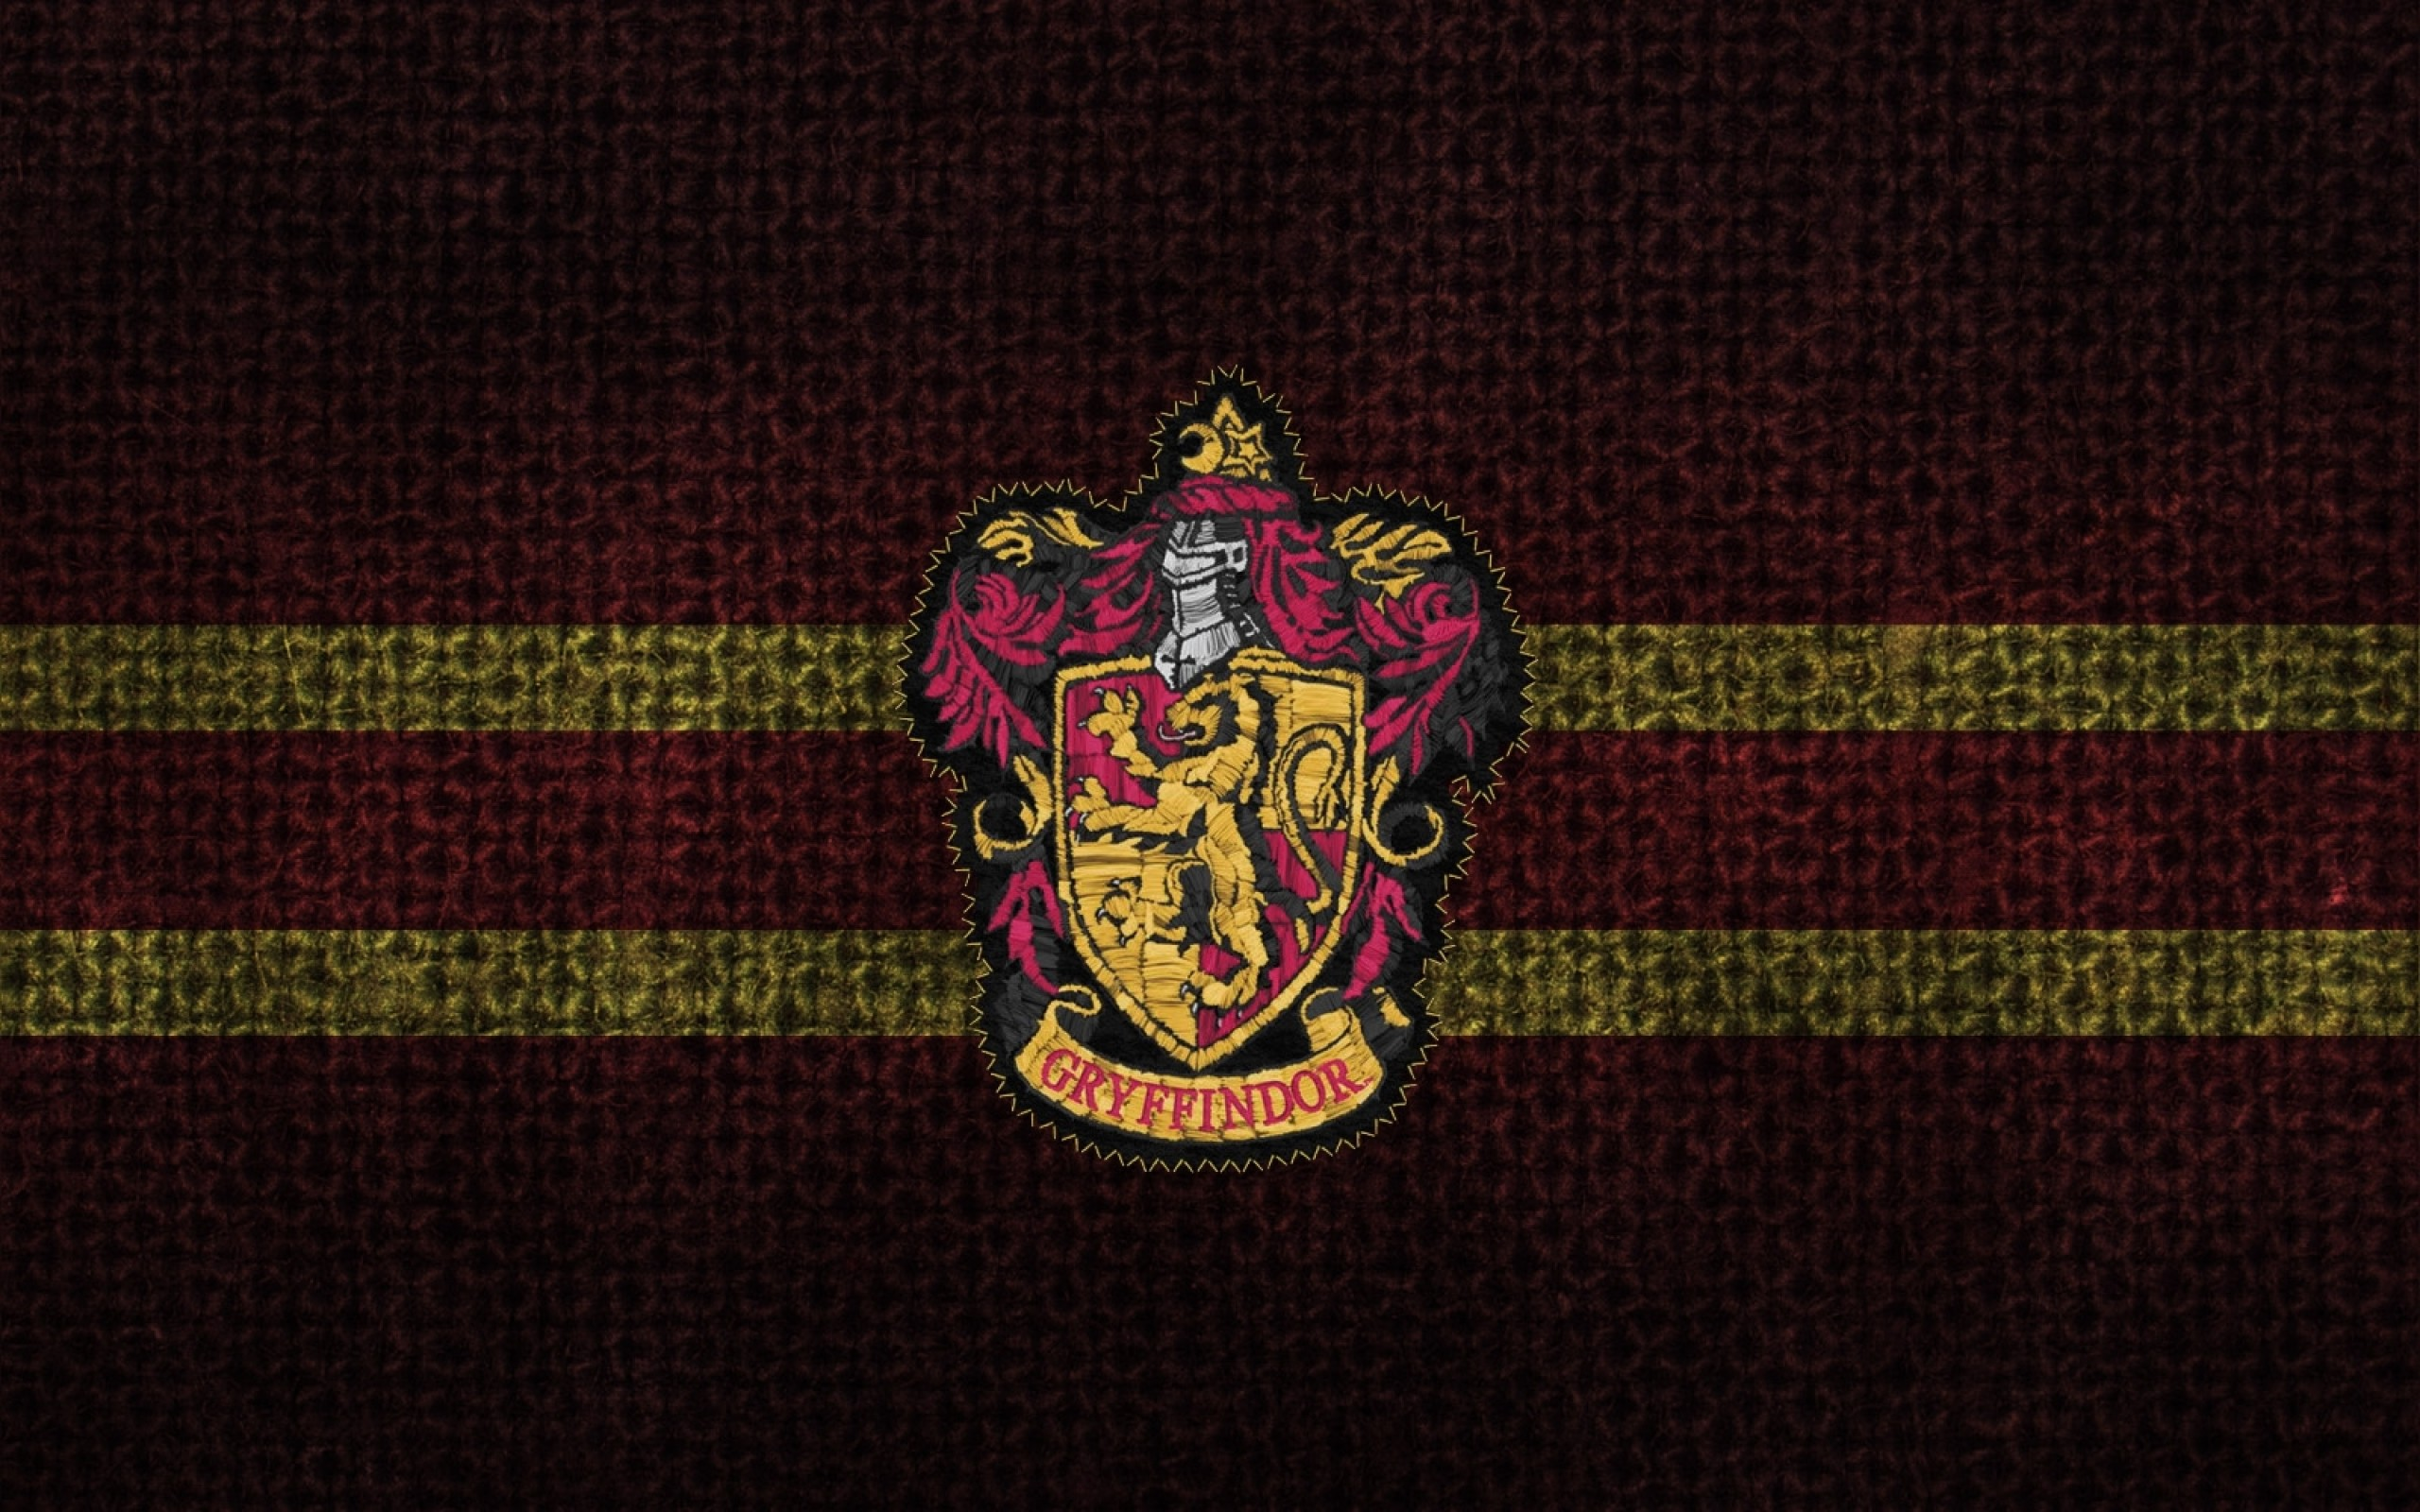 2560x1600 Harry Potter Crest Gryffindor Hogwarts 1600x1089 Wallpaper Art HD